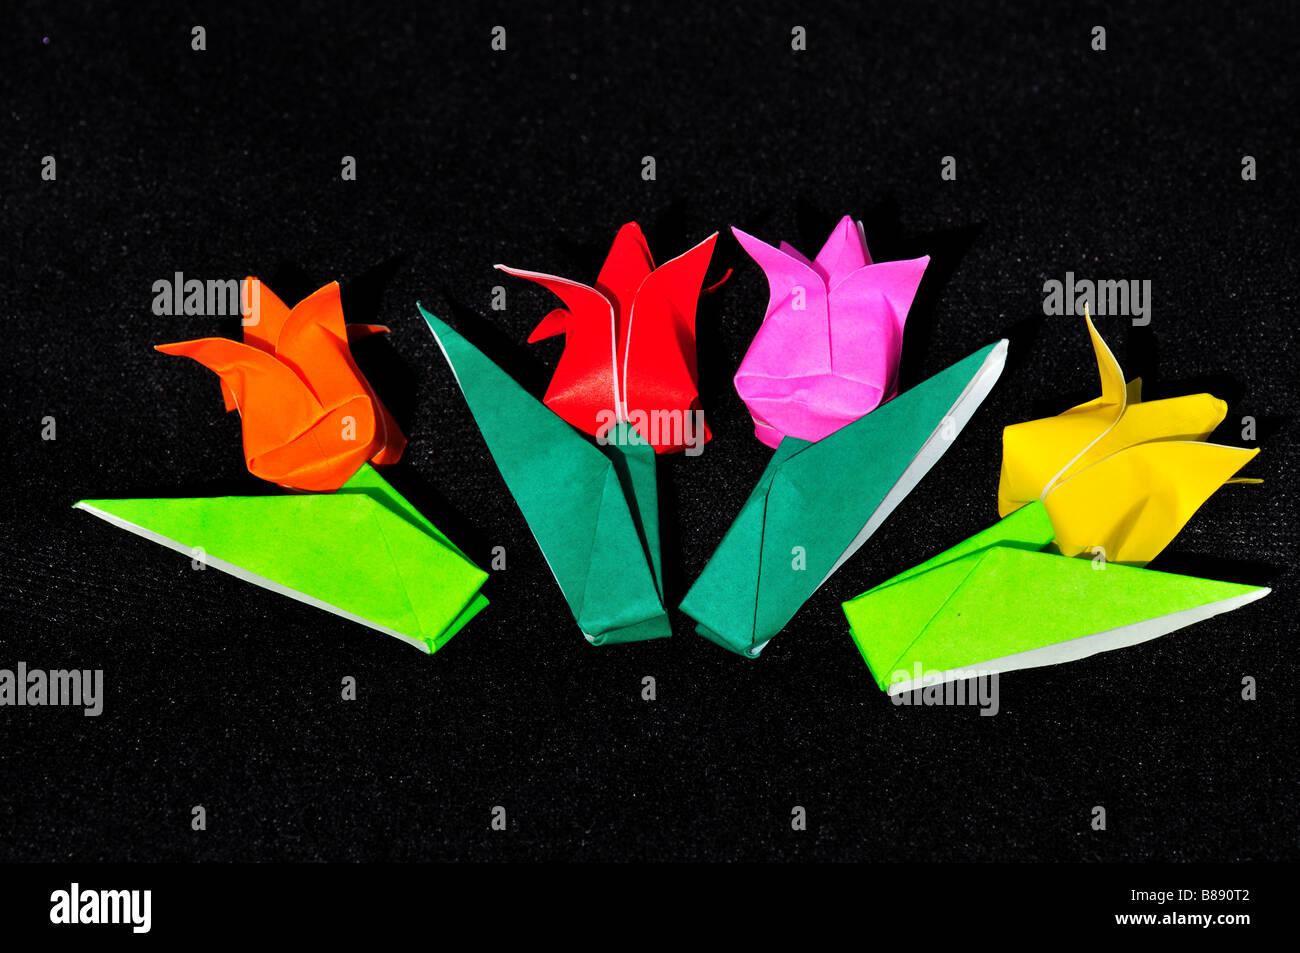 Origami Japanese Paper Folding Art Stock Photos Origami Japanese